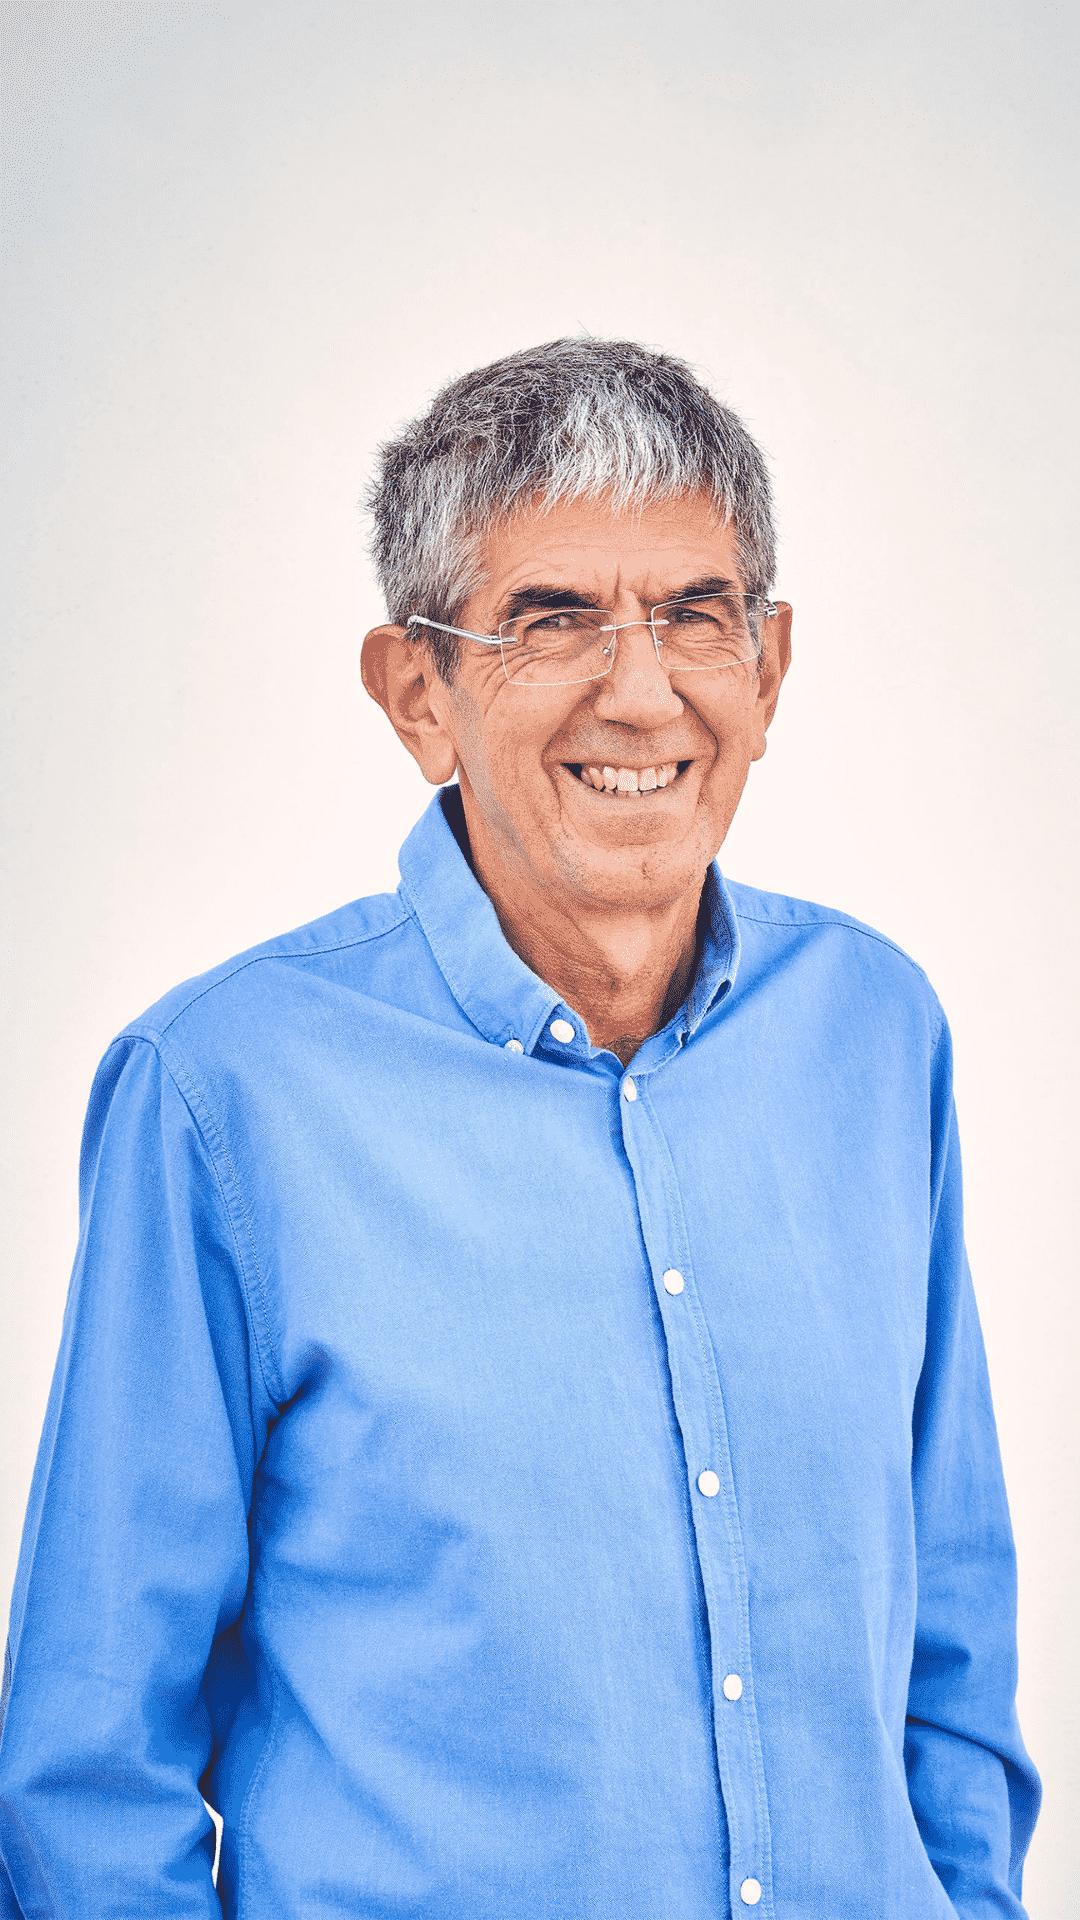 Dr. Karmelo Bizkarra